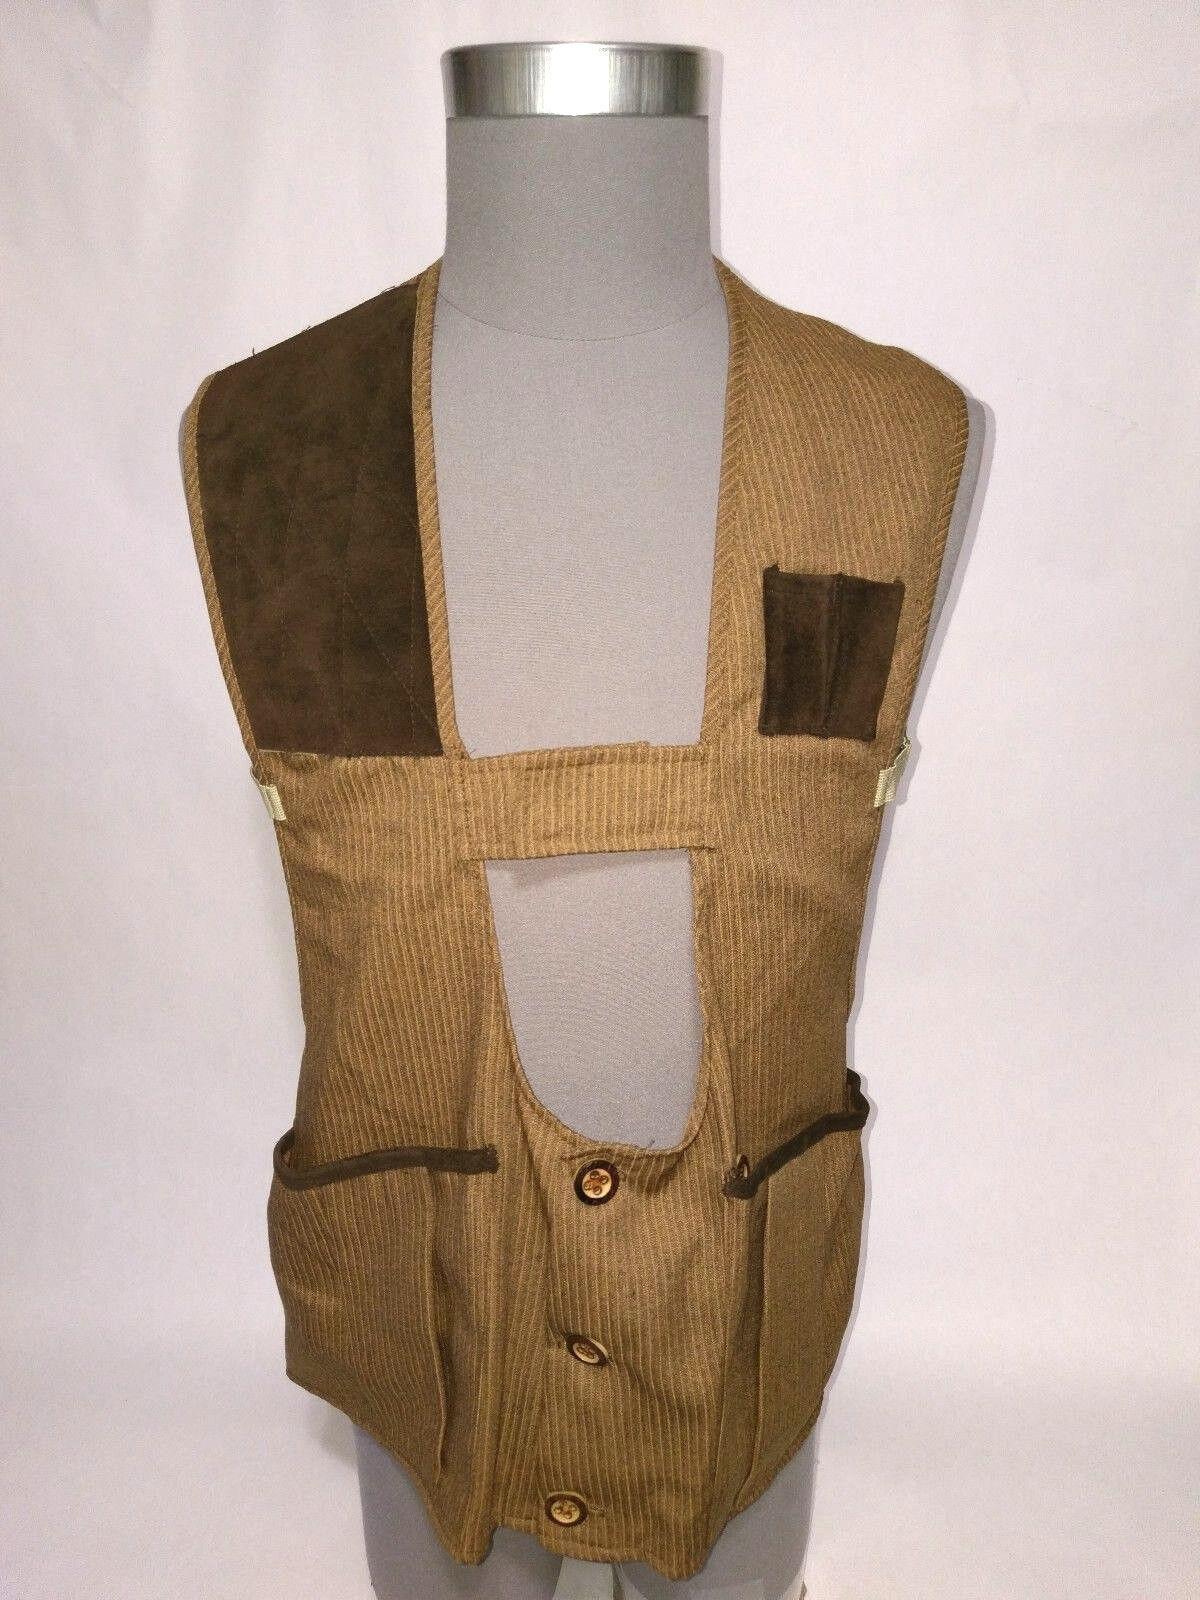 Vintage Redhead MASTERS Hunting Shooting Vest Suede Leather Brown Medium  Vented  exclusive